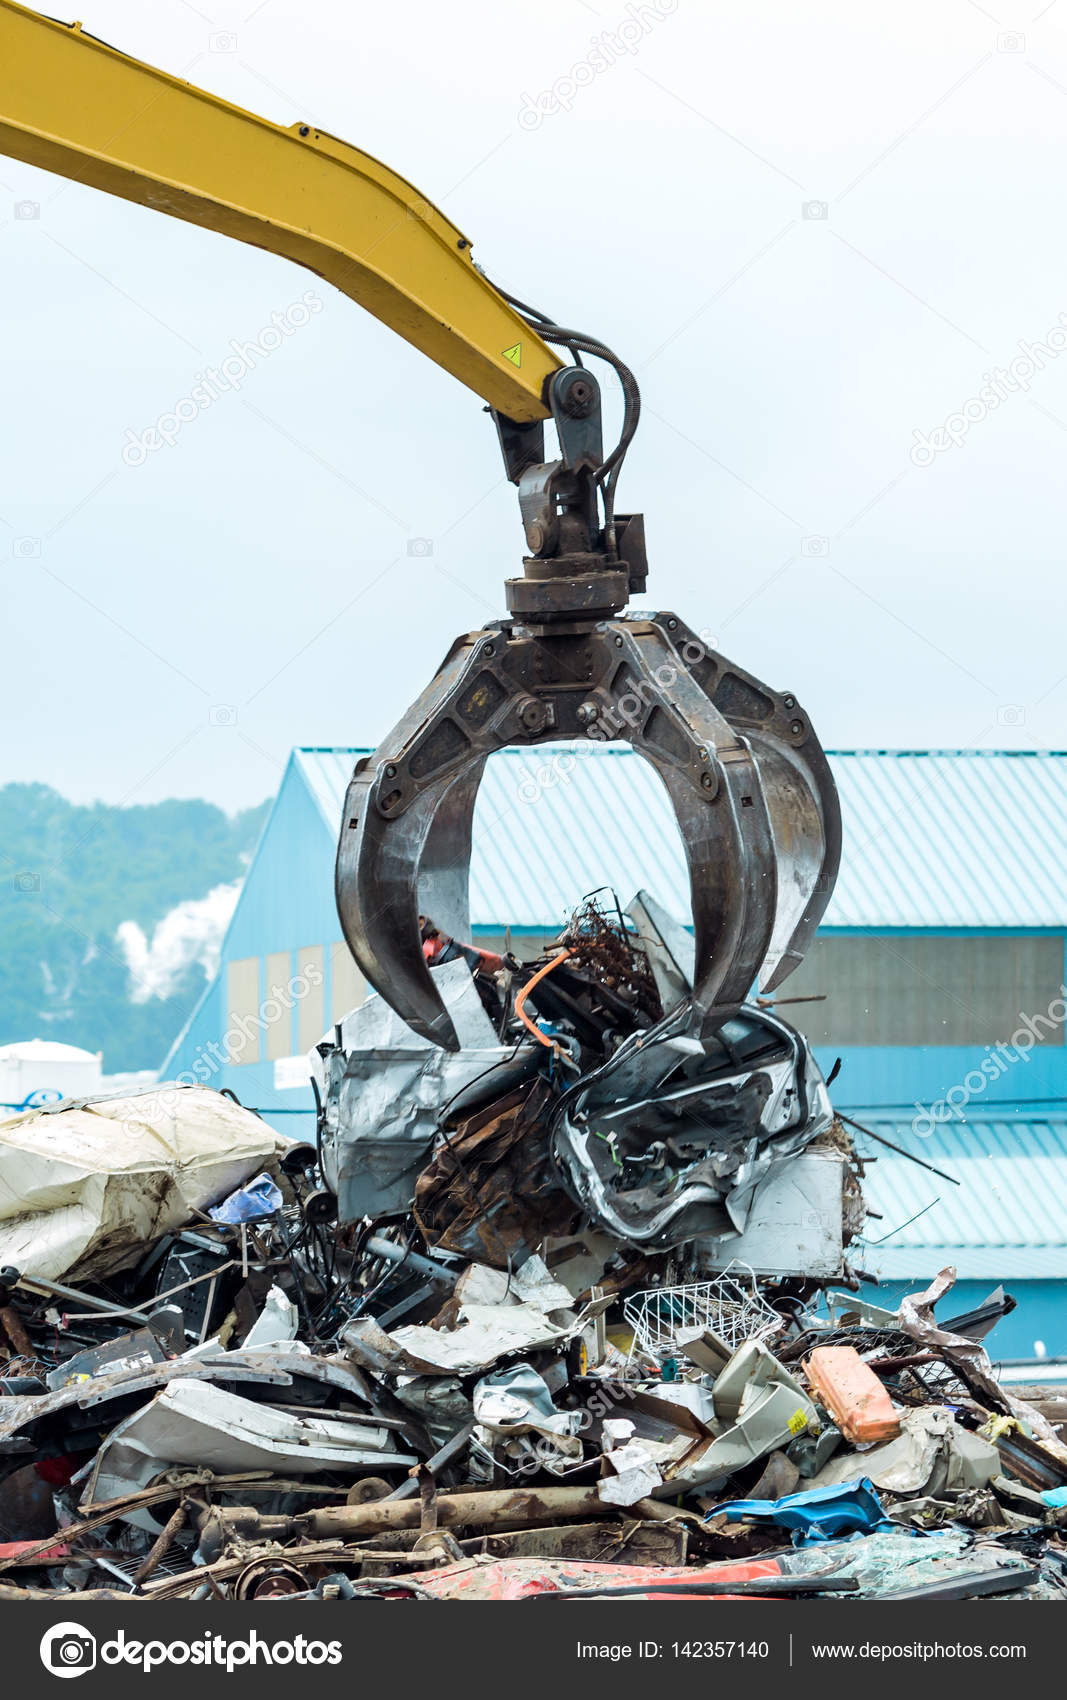 Metal Scrap Yard Crane — Stock Photo © mary981 #142357140